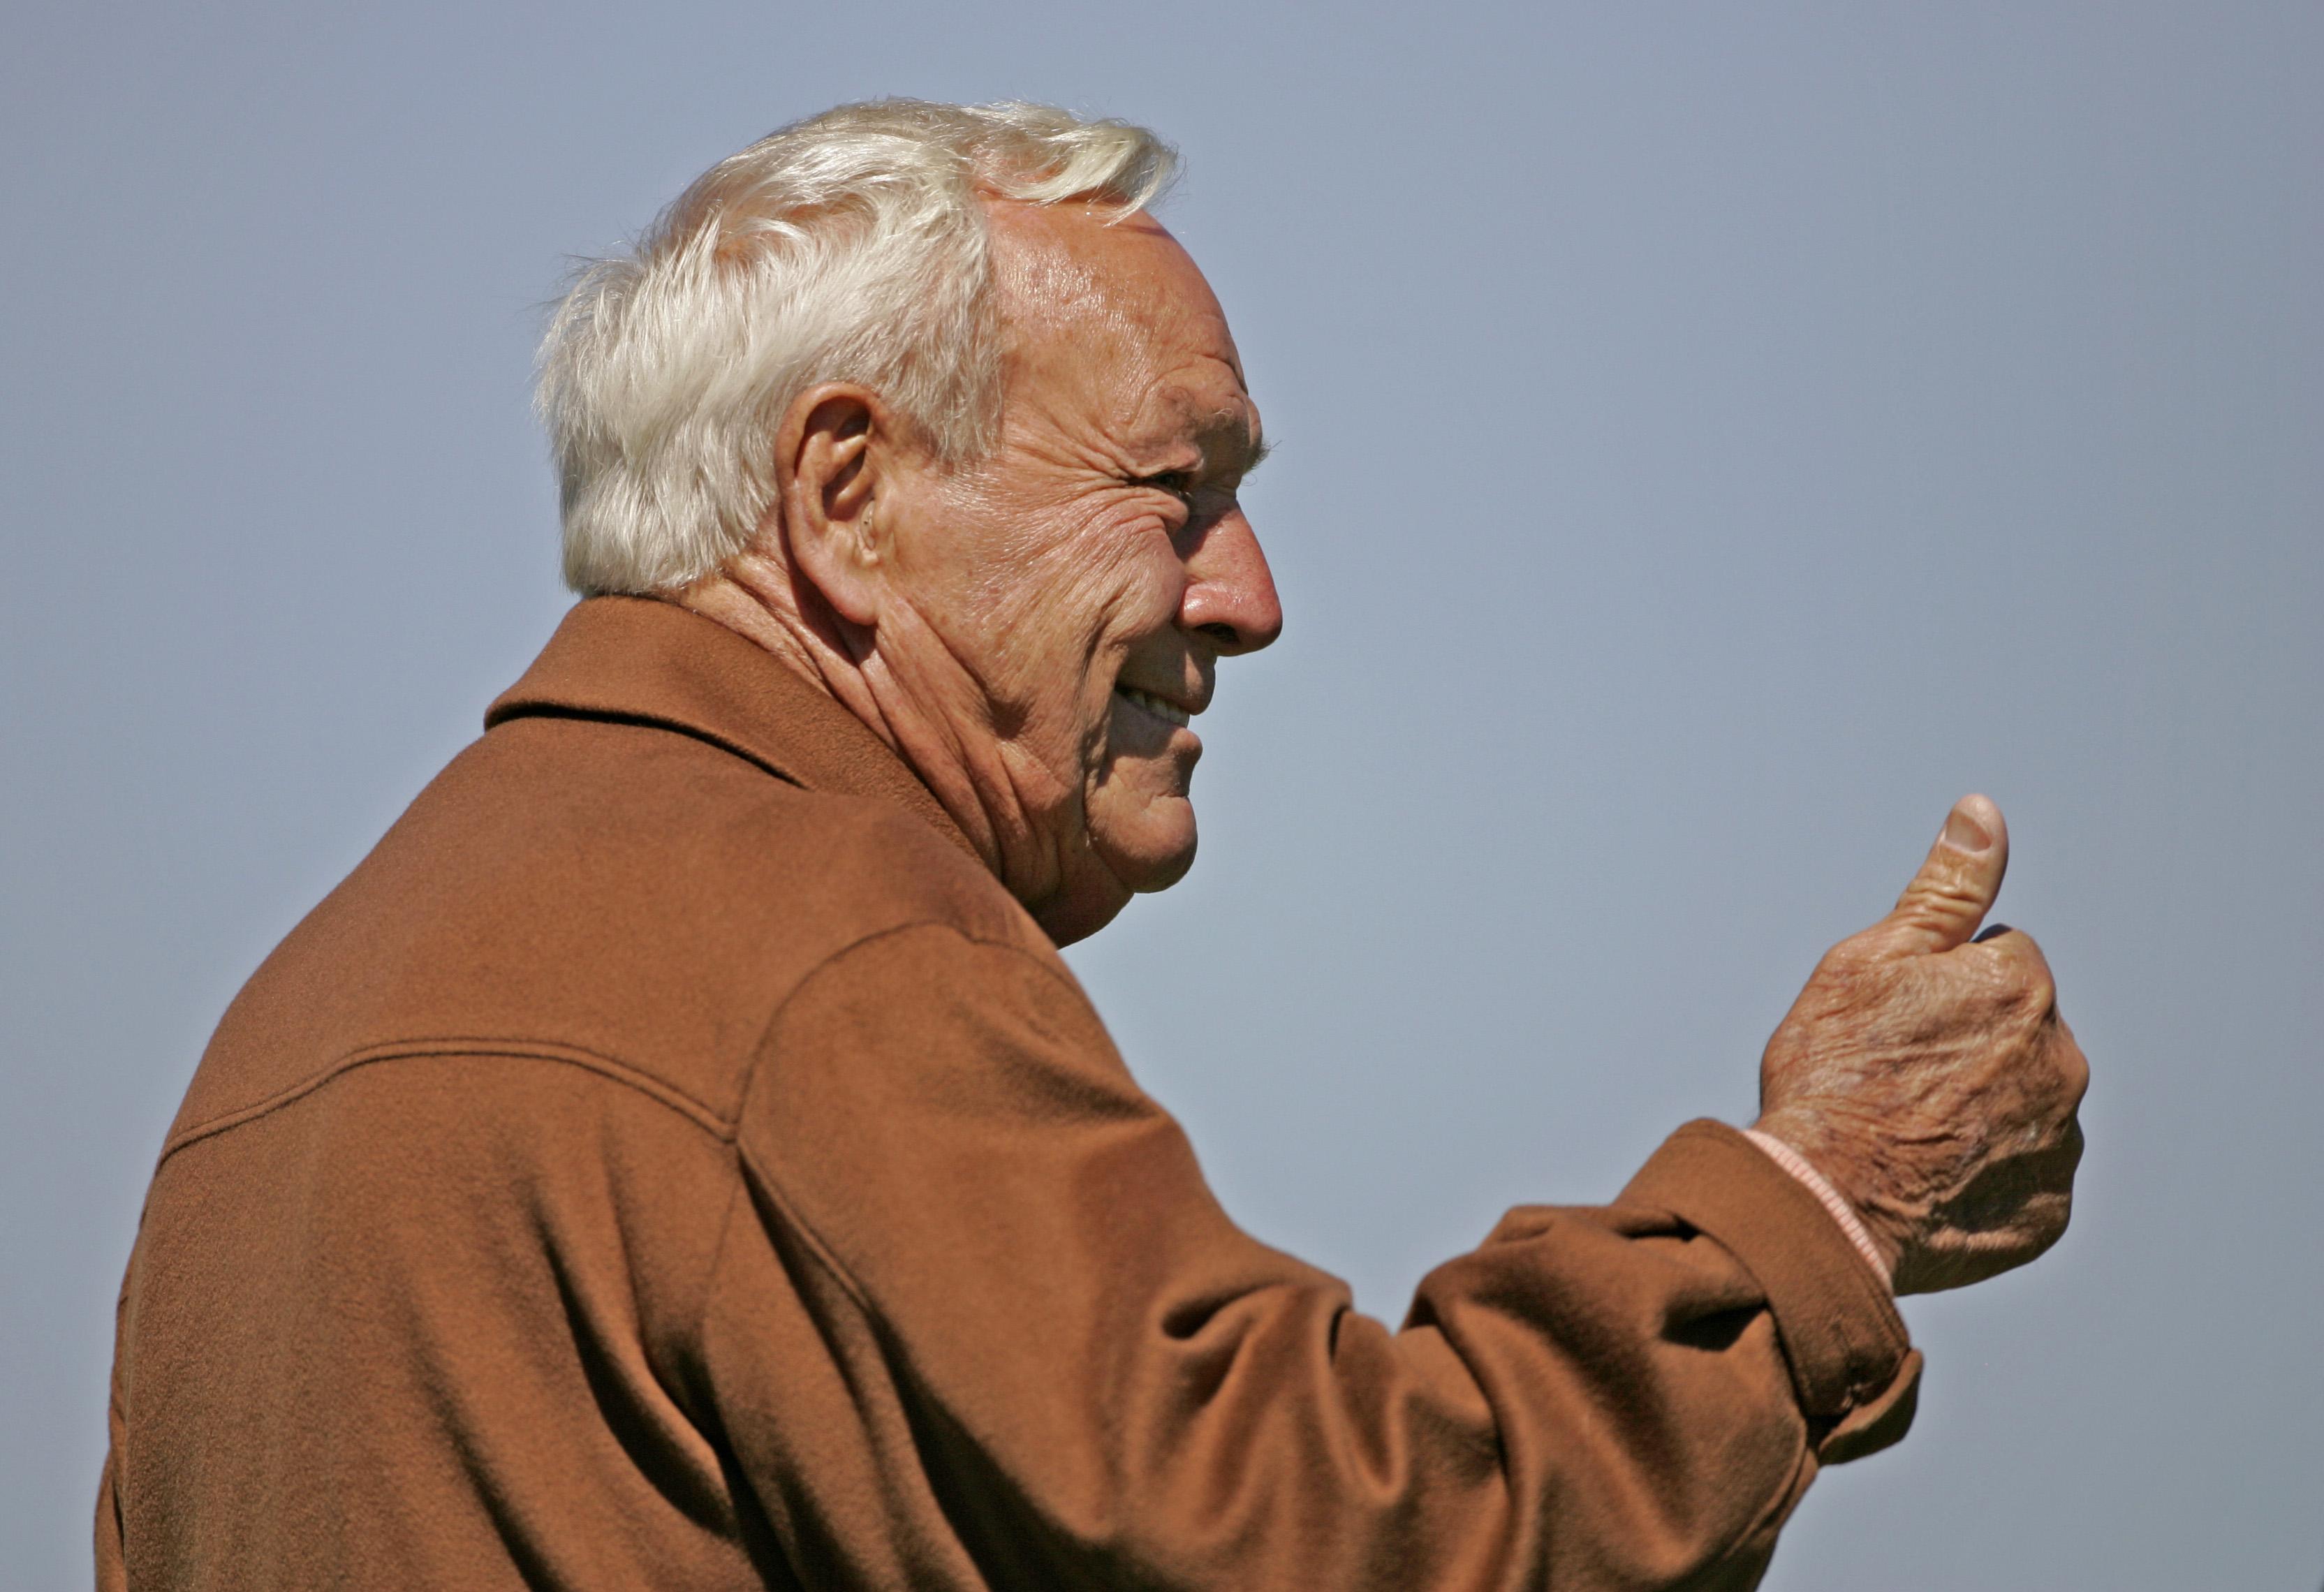 Arnold Palmer collected an astounding amount of golf memorabilia throughout his legendary career.